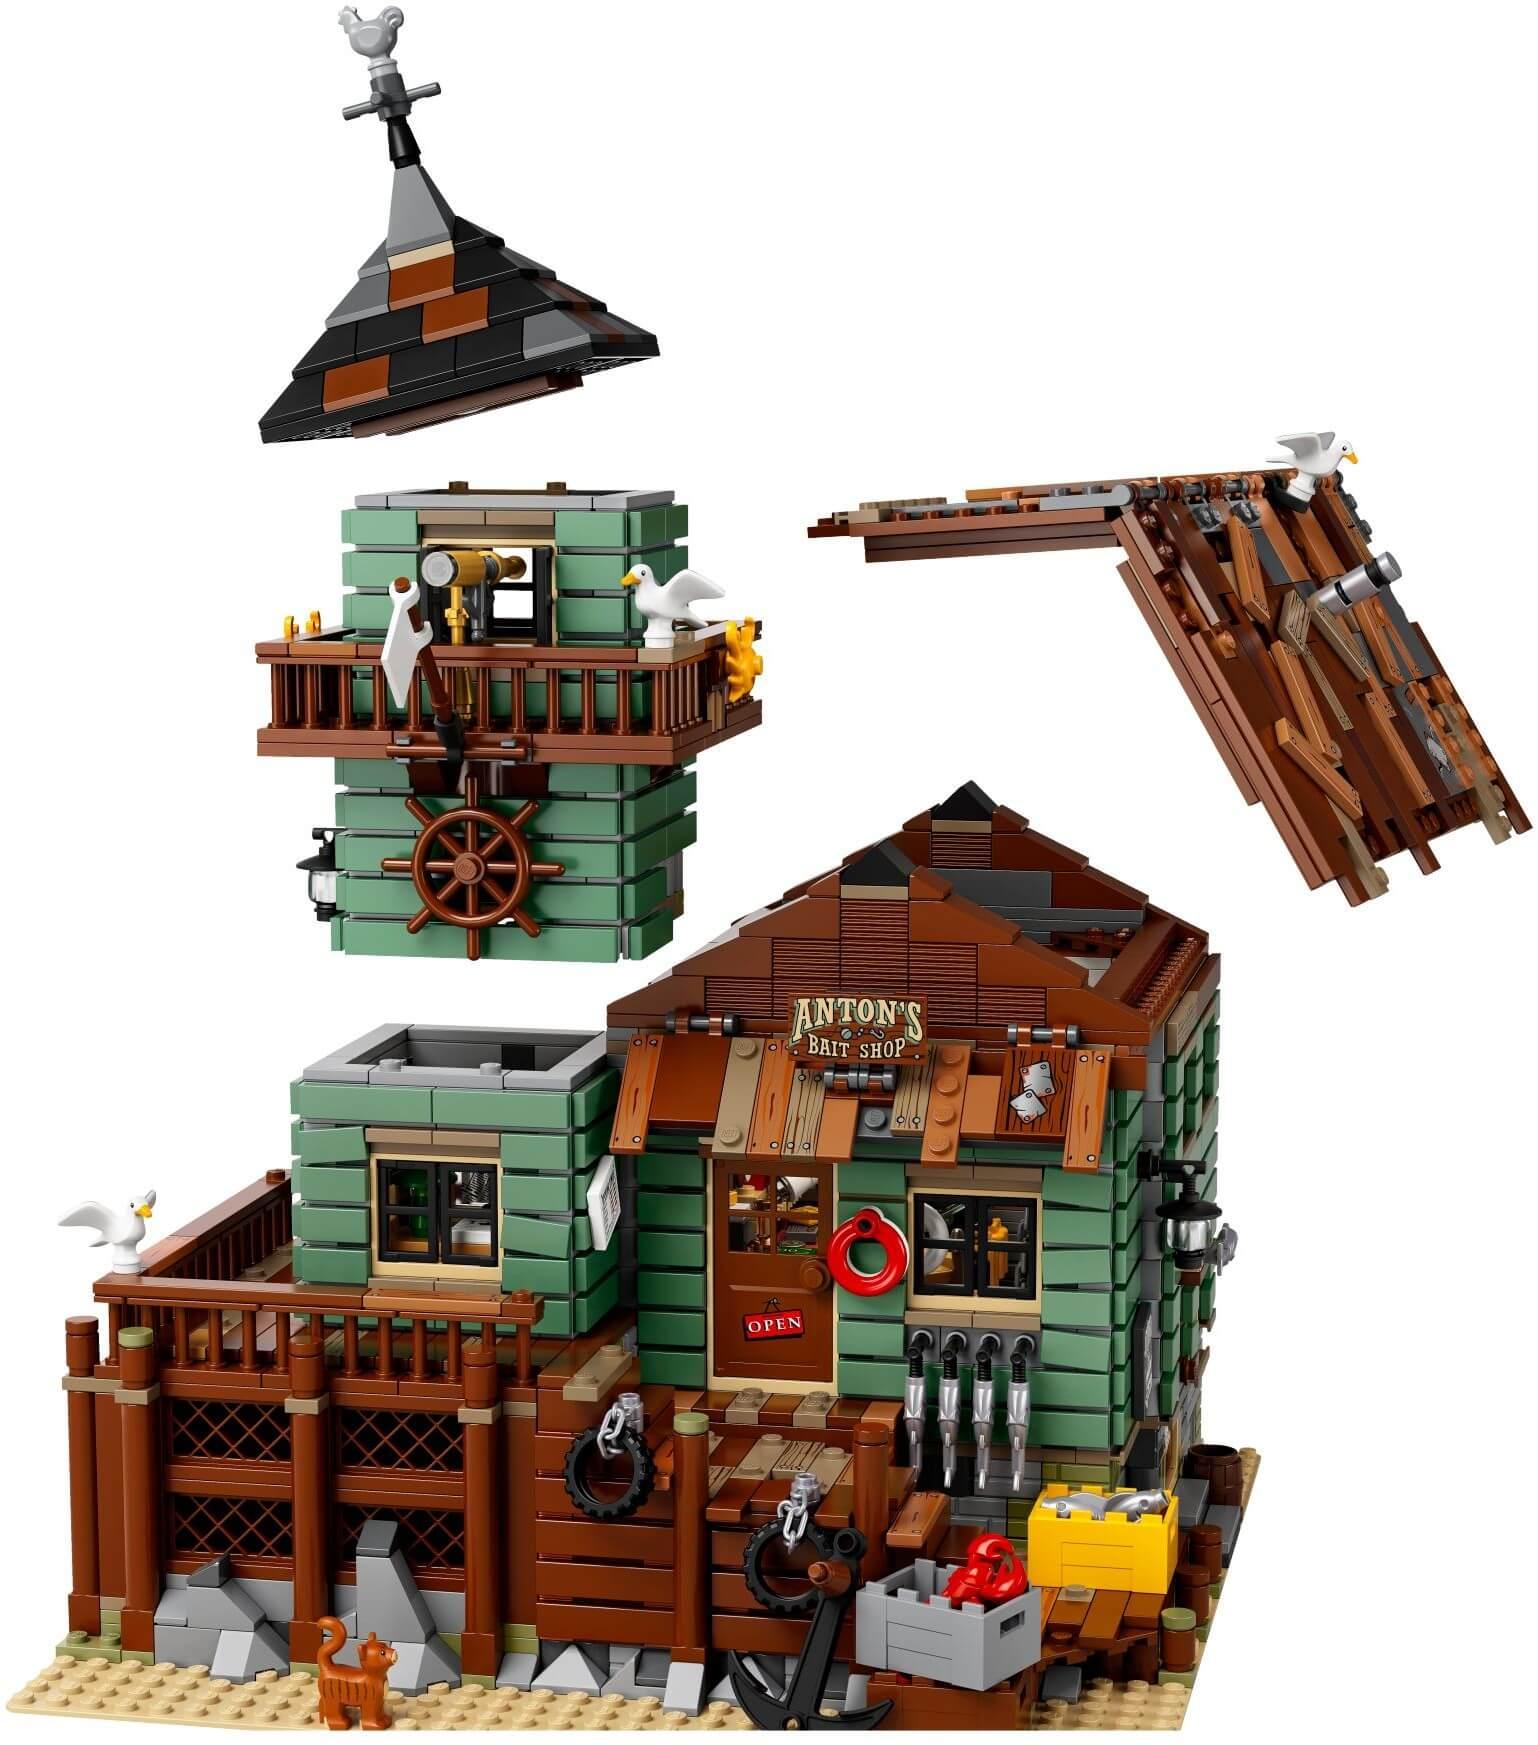 Mua đồ chơi LEGO 21310 - LEGO Ideas 21310 - Nhà Cổ Làng Chài (LEGO Ideas Old Fishing Store)